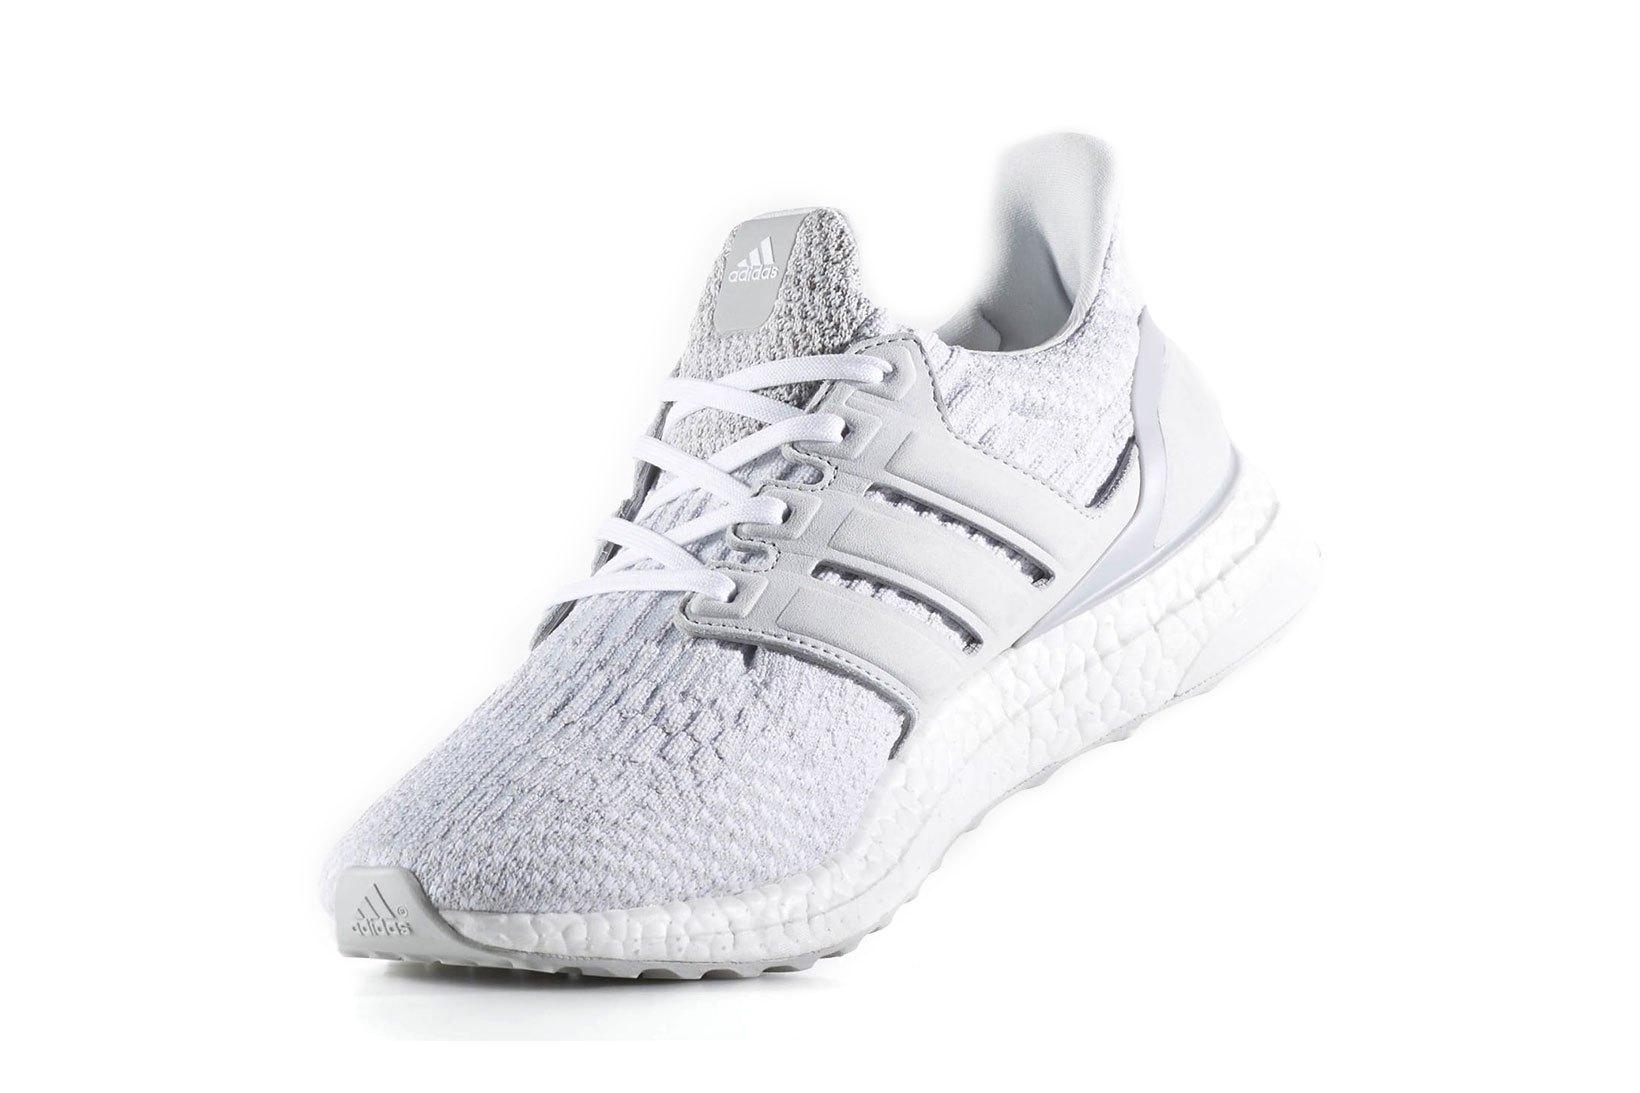 Reigning Champ и adidas представляют новую модель кроссовок на подошве UltraBOOST